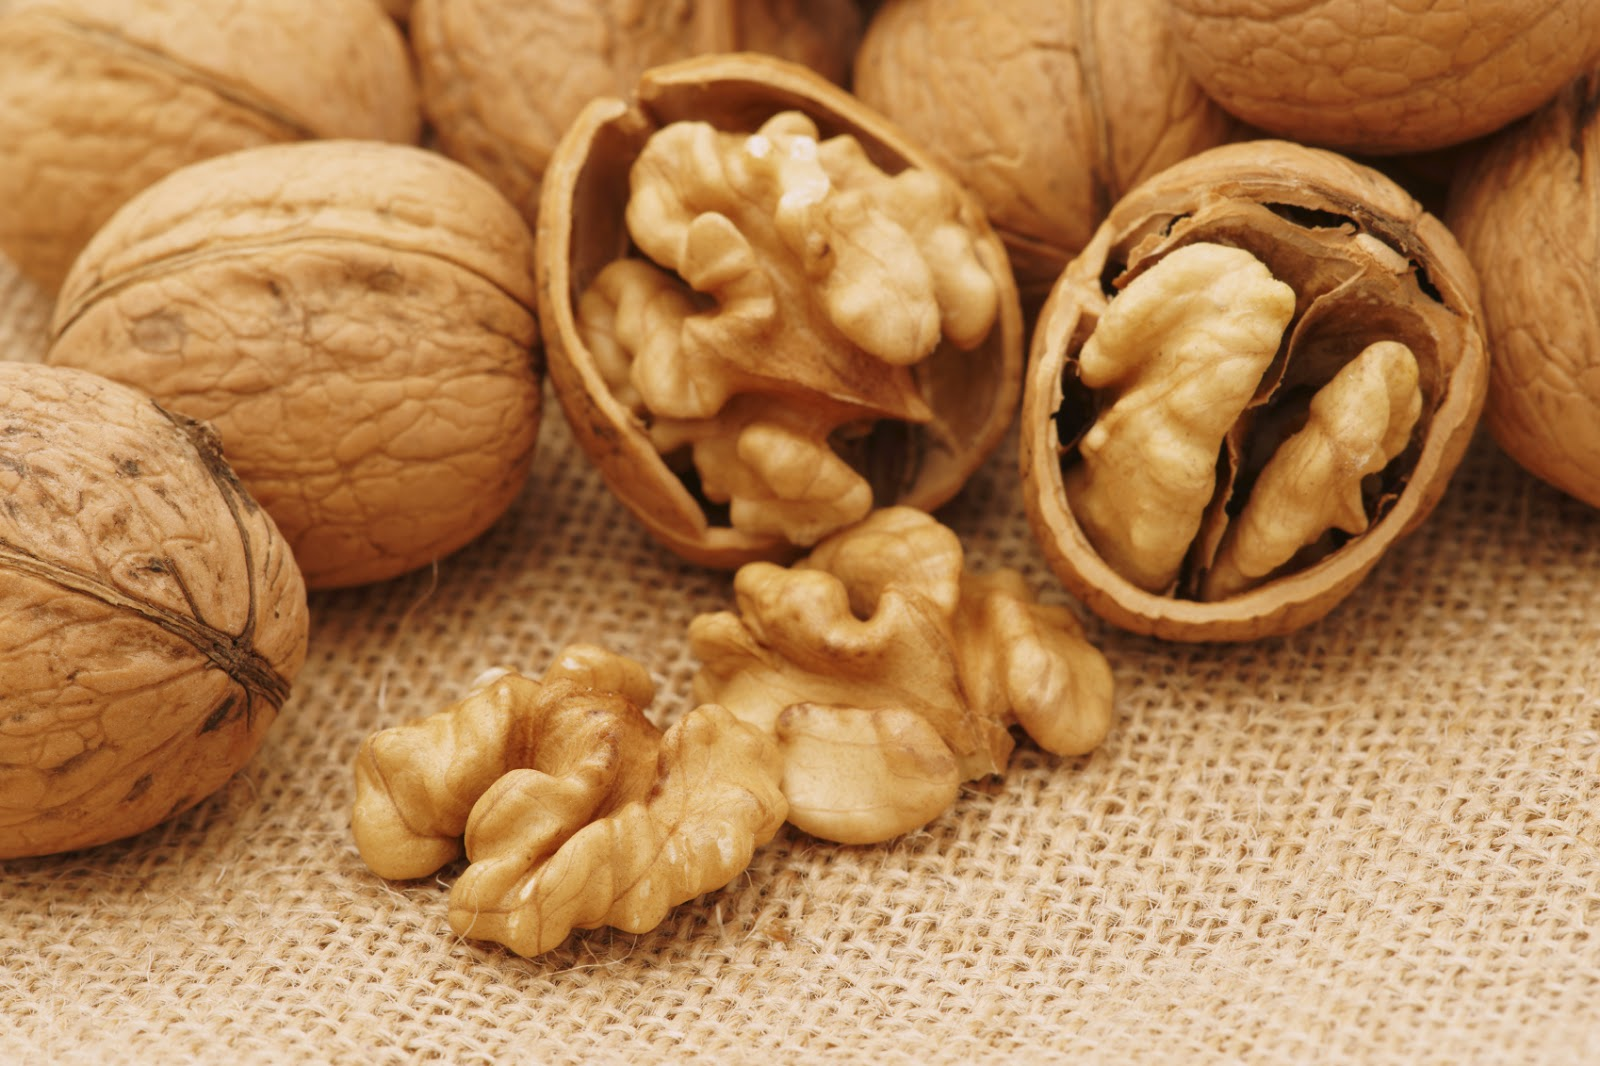 Walnuts, health tips, hair tips